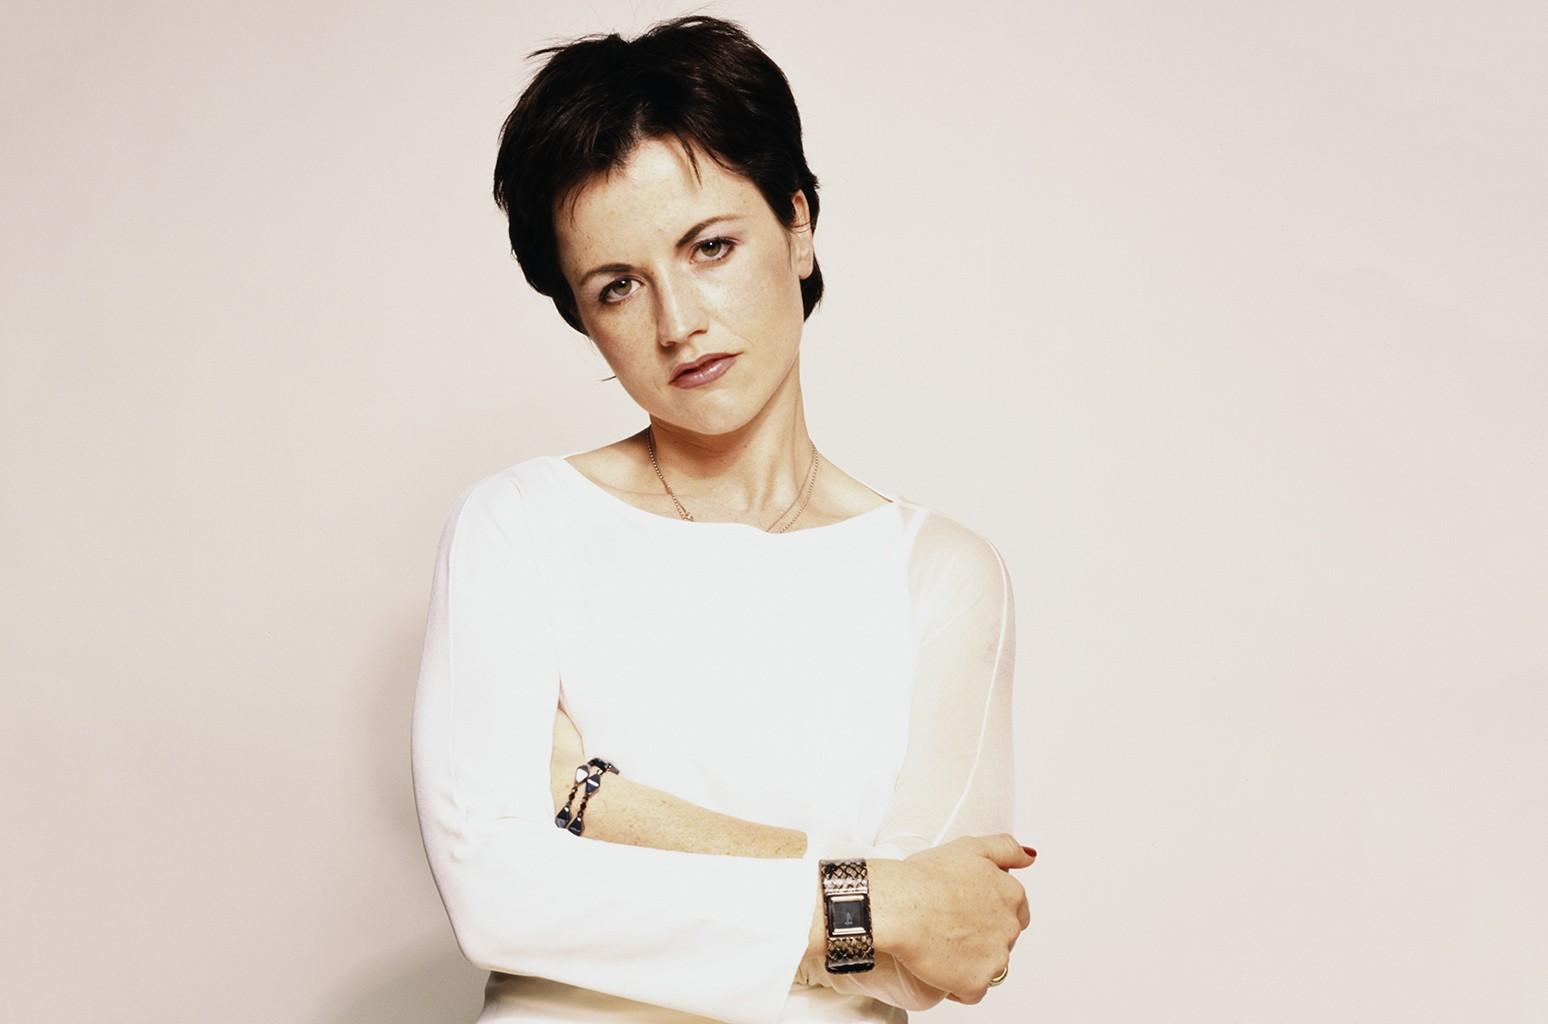 Dolores O'Riordan of The Cranberries.